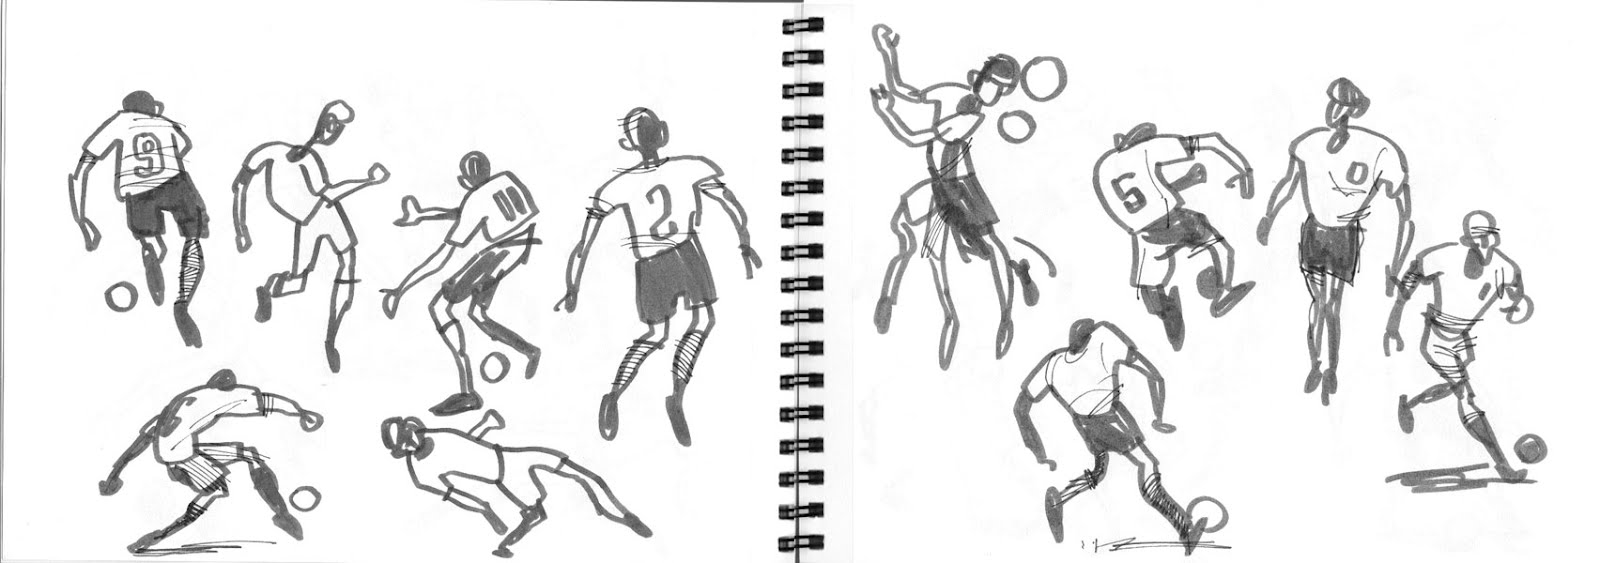 Football Doodles During Euro 2012 QF England - Italy